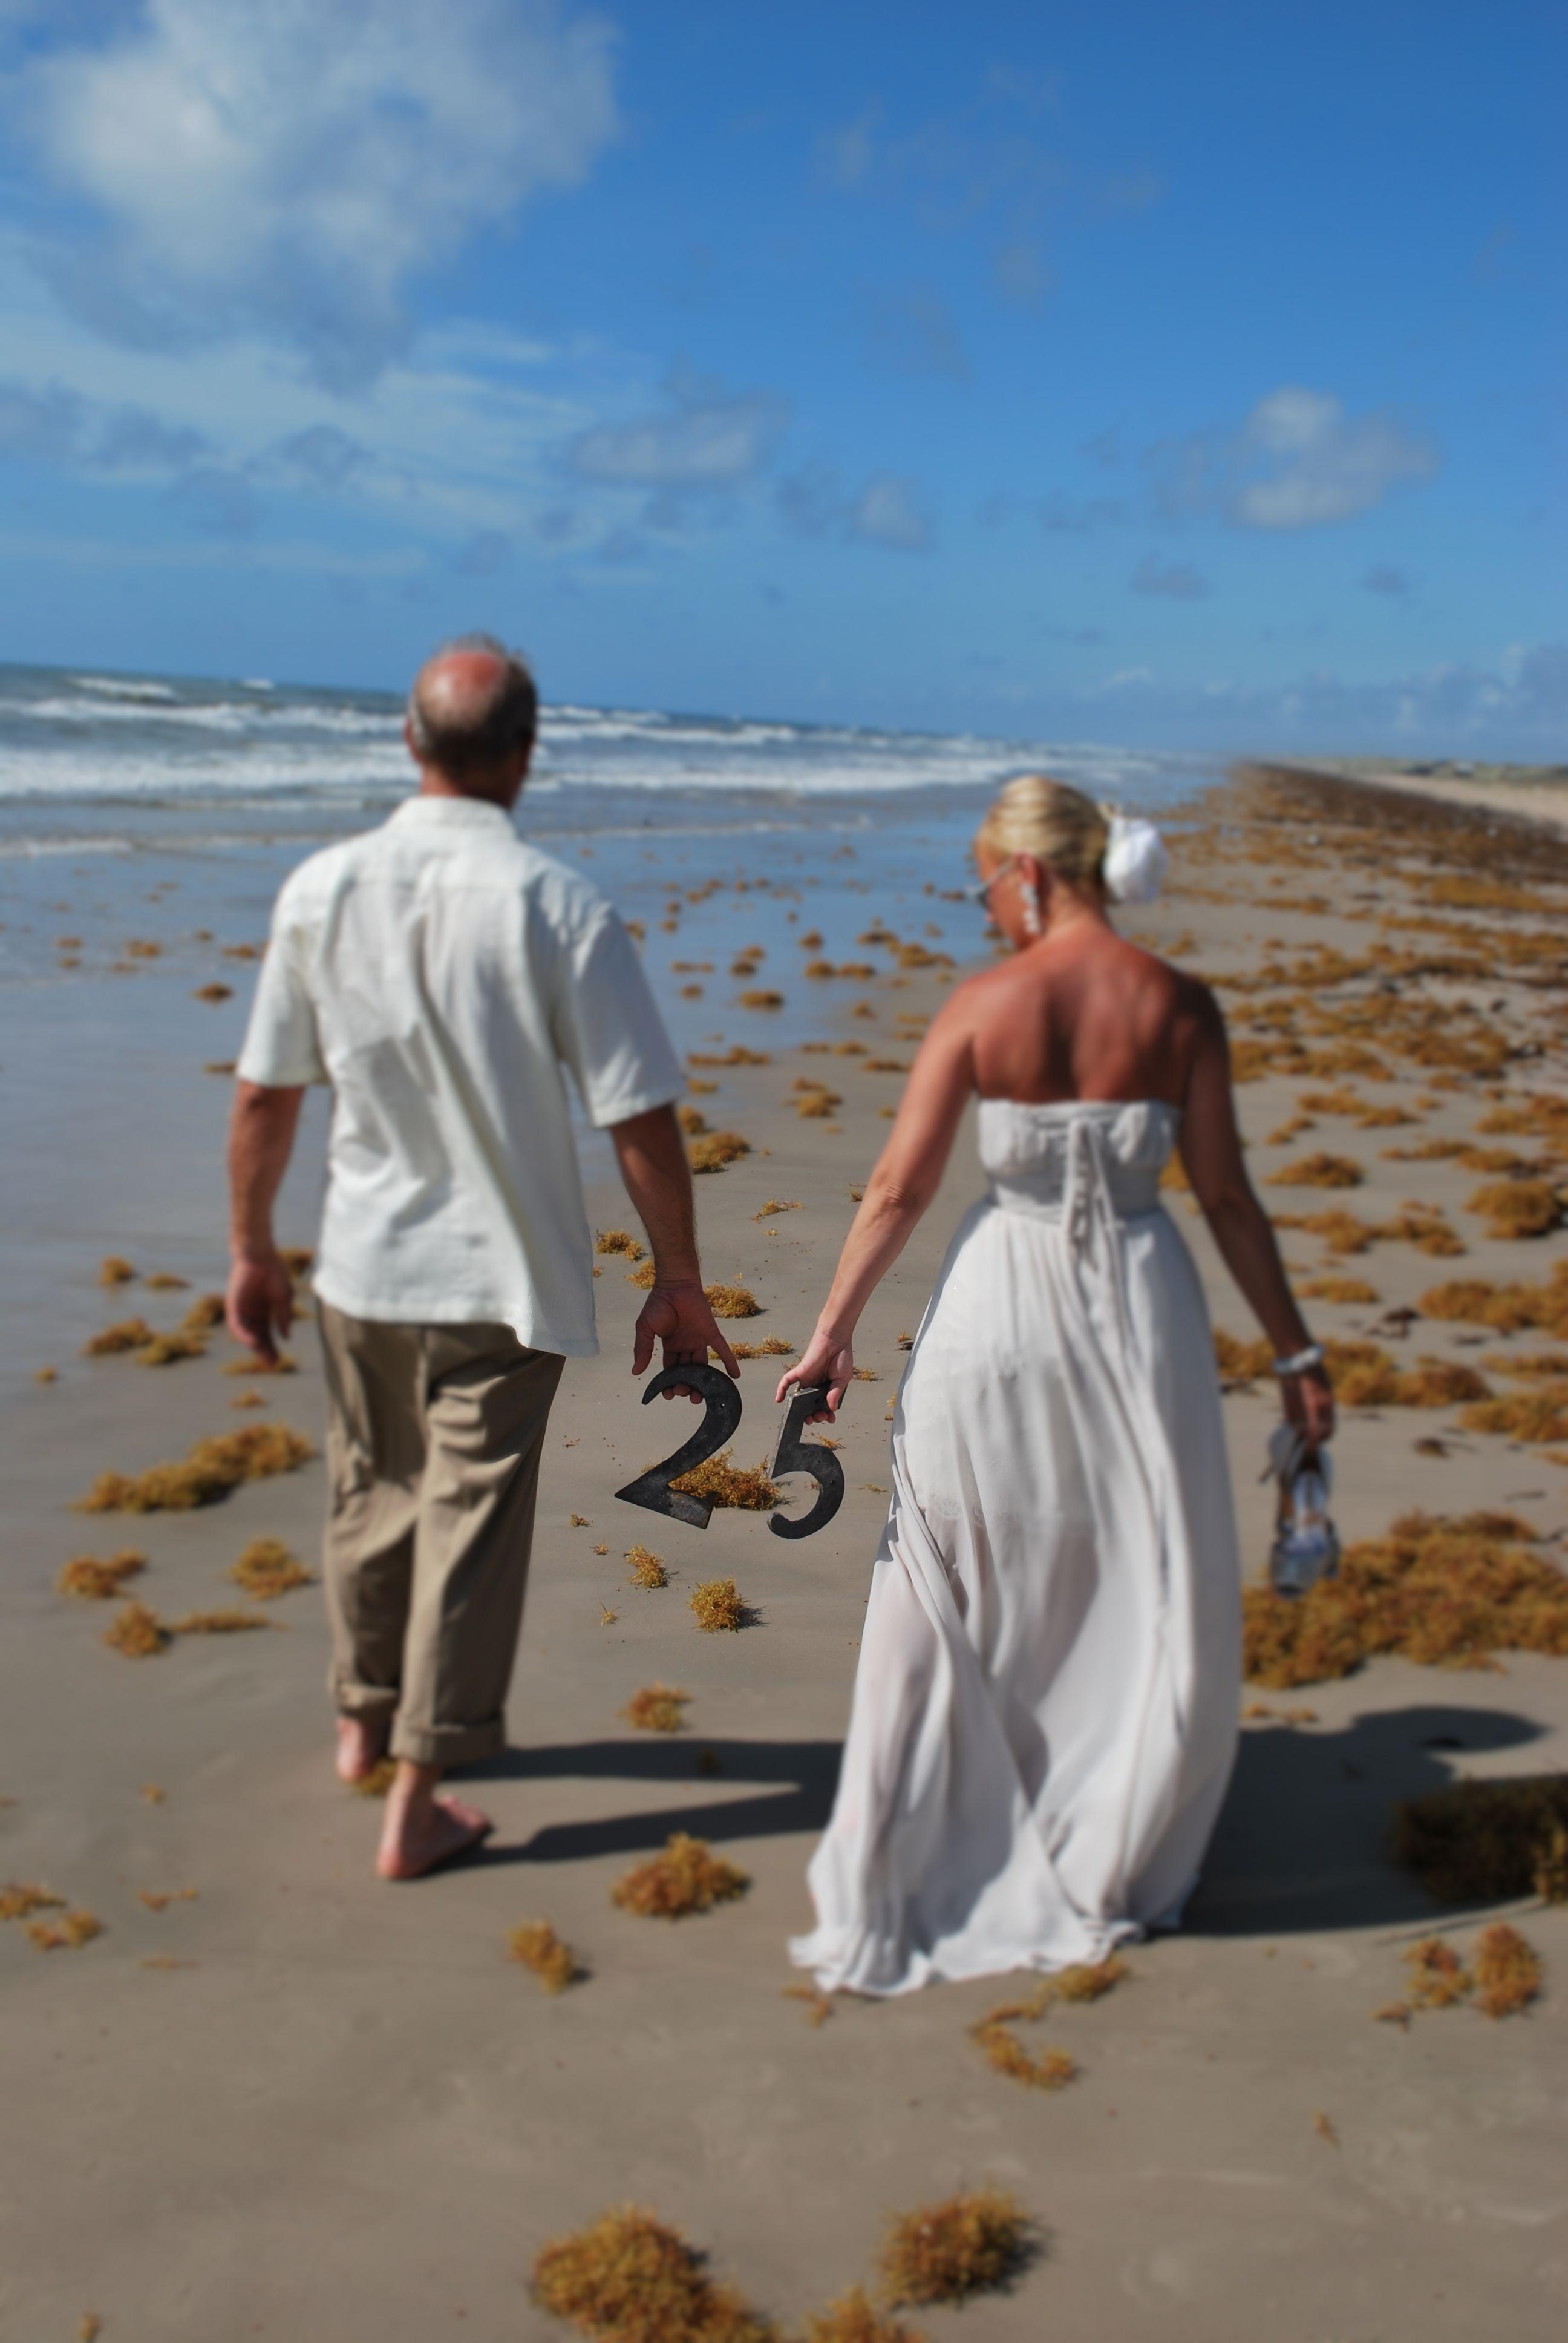 invitations wedding renewal vows ceremony%0A   th anniversary beach wedding vow renewal